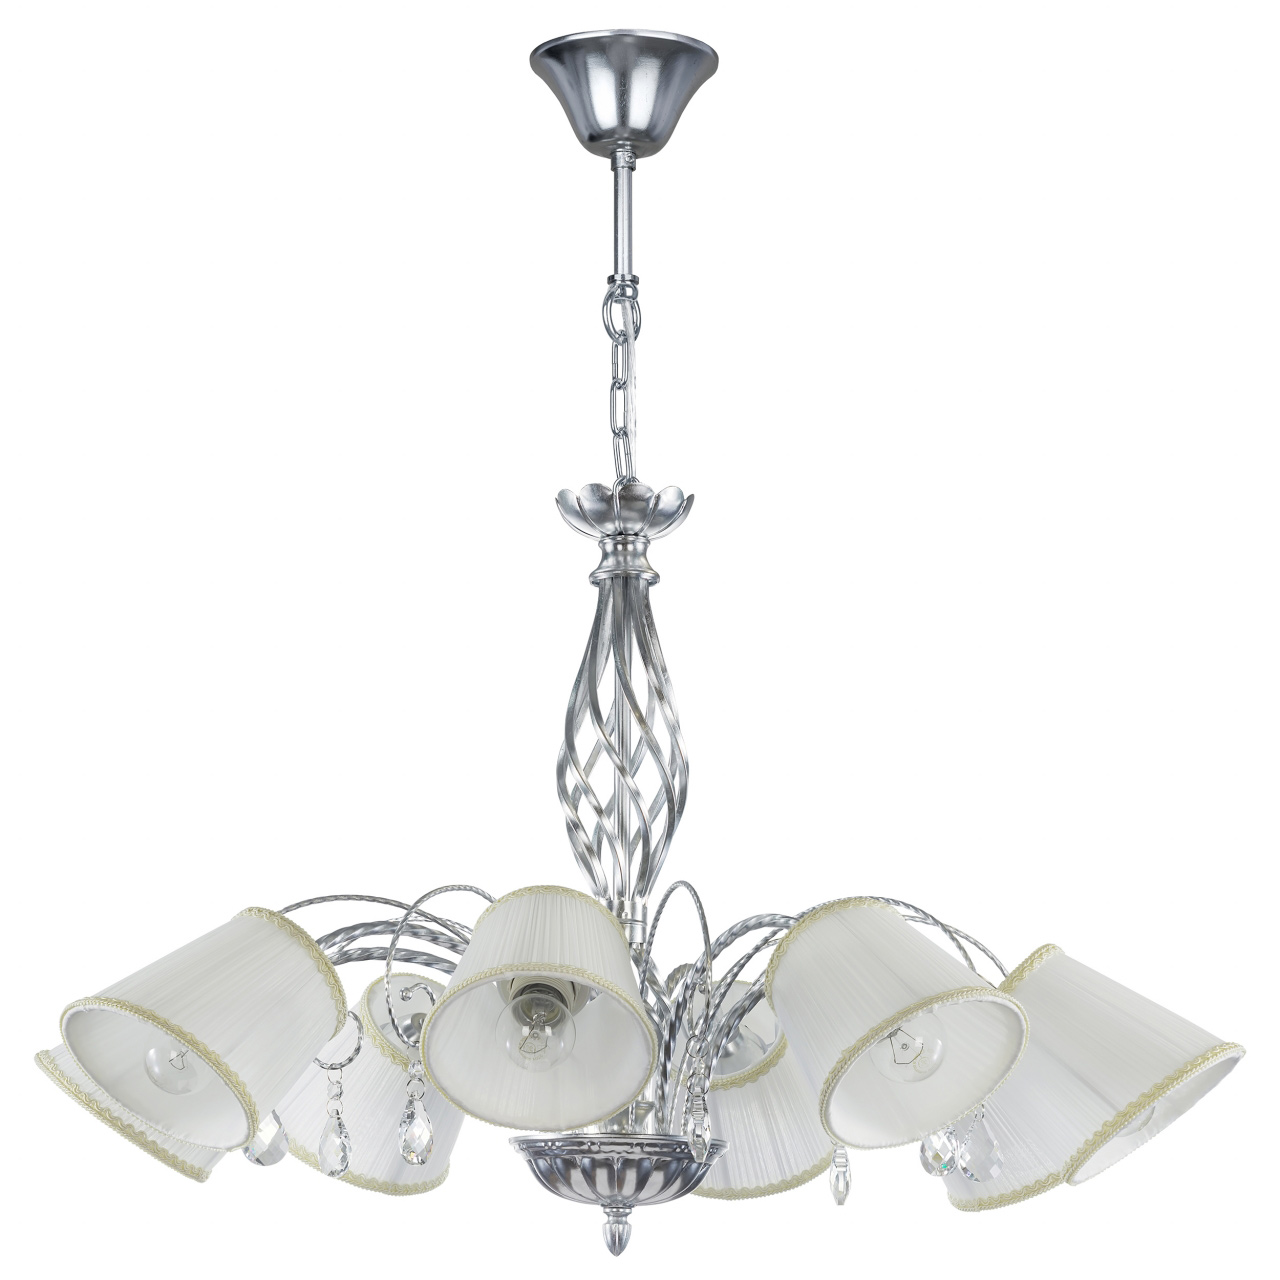 Люстра подвесная Esedra 8x40W E27 silver foil ткань Lightstar 796189